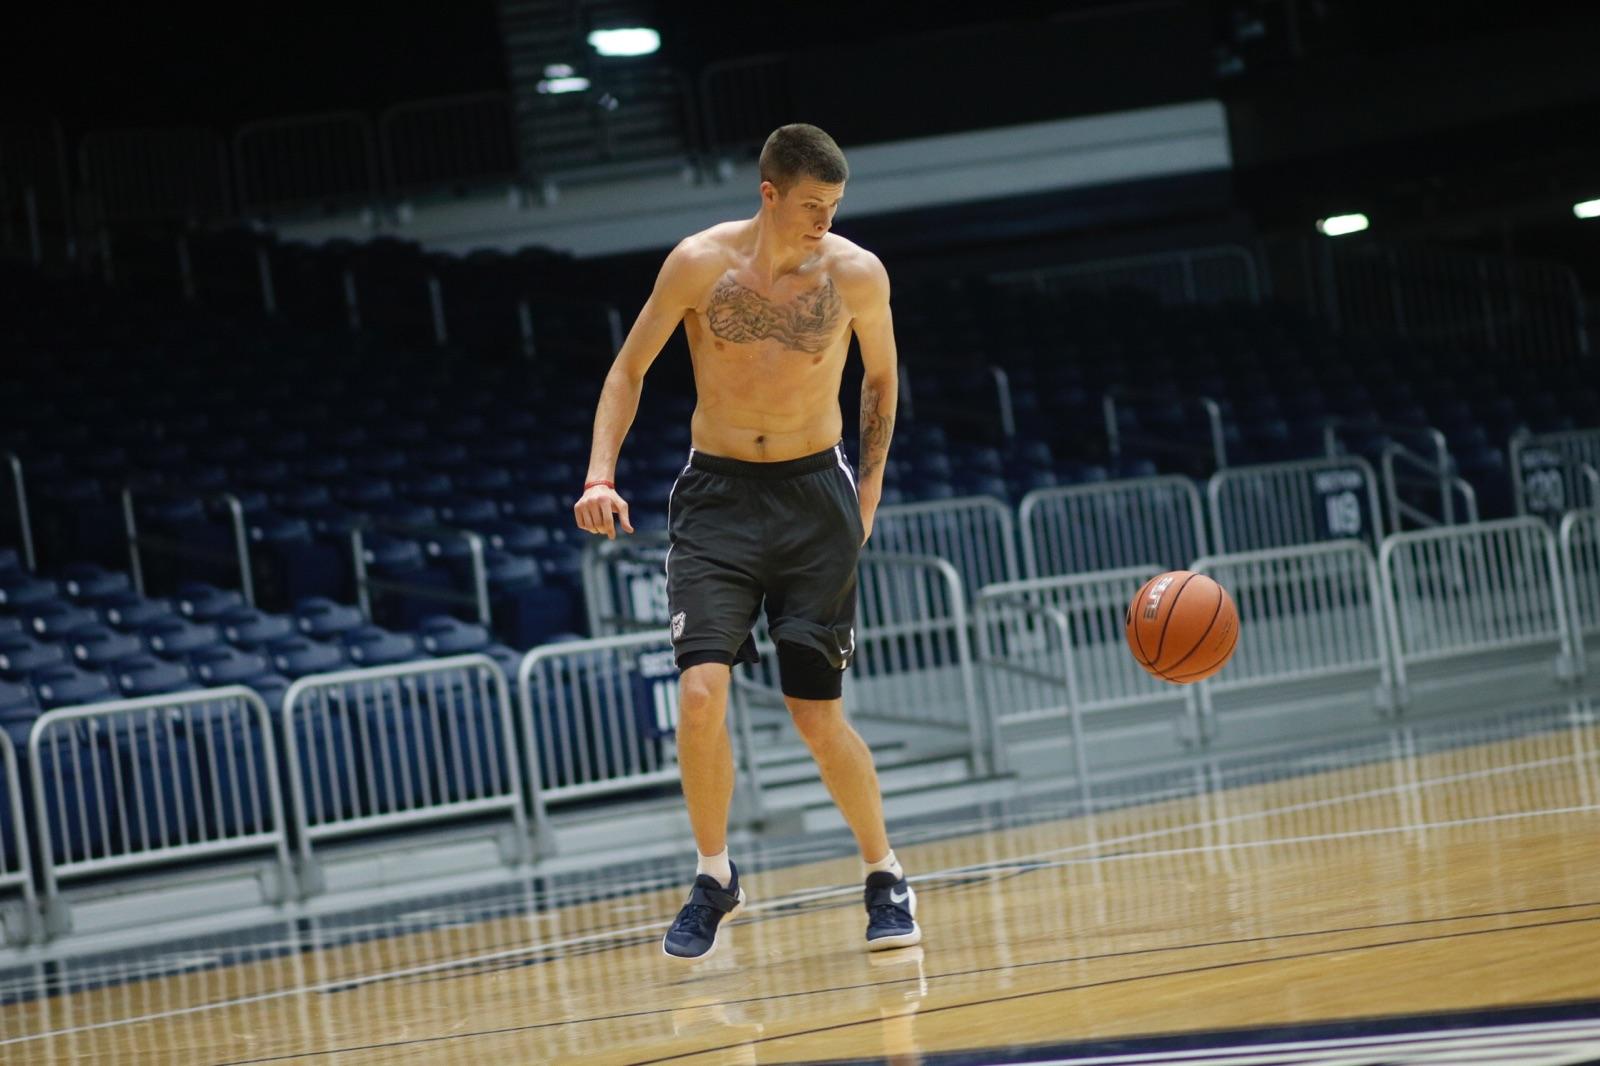 585db1b58 Butler basketball redshirt sophomore Sean McDermott dribbles the ball in  open gym at Hinkle Fieldhouse. McDermott has gotten three tattoos since  entering ...